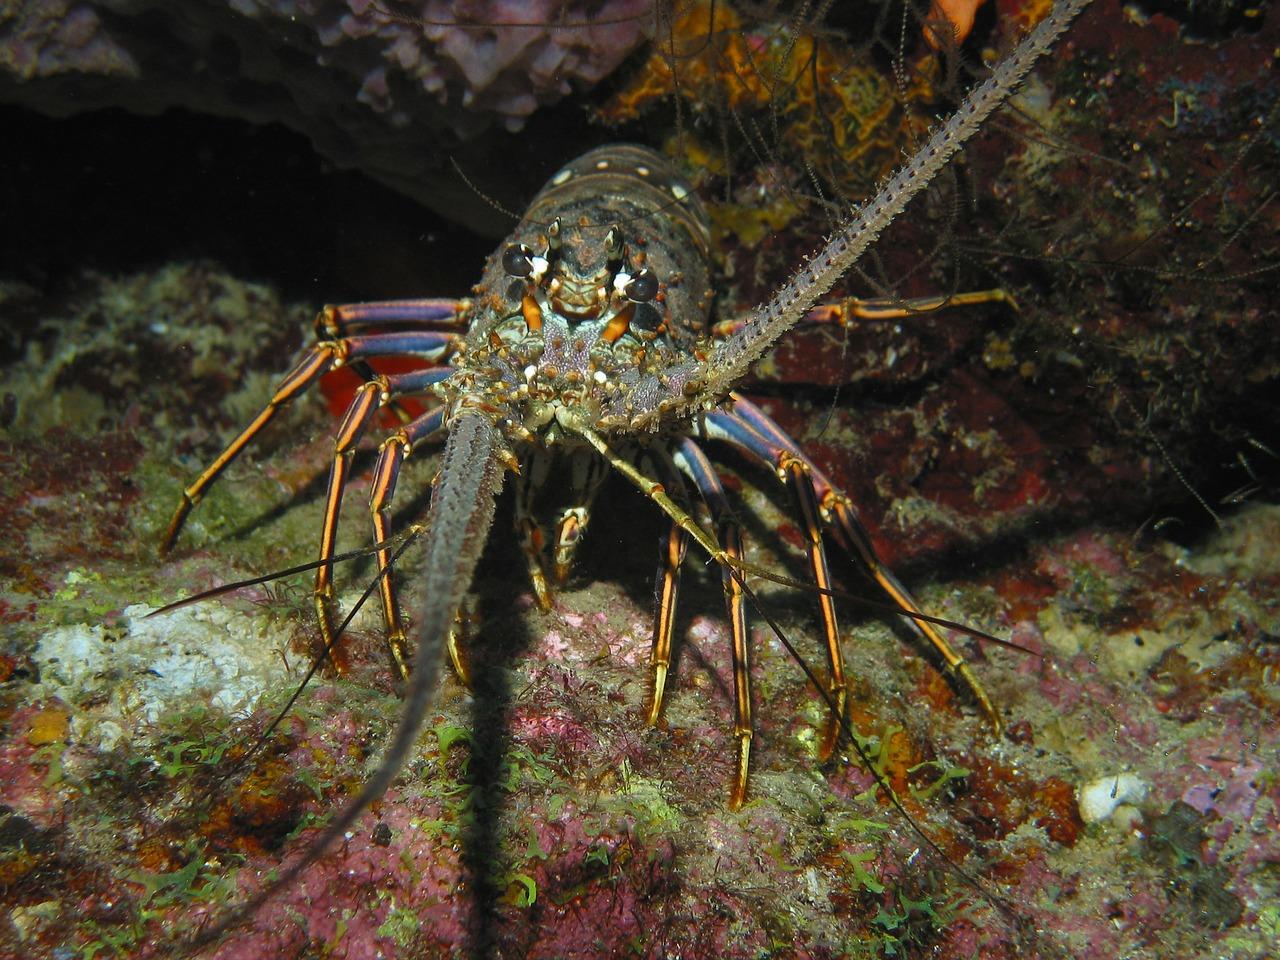 lobster mini-season in South Florida